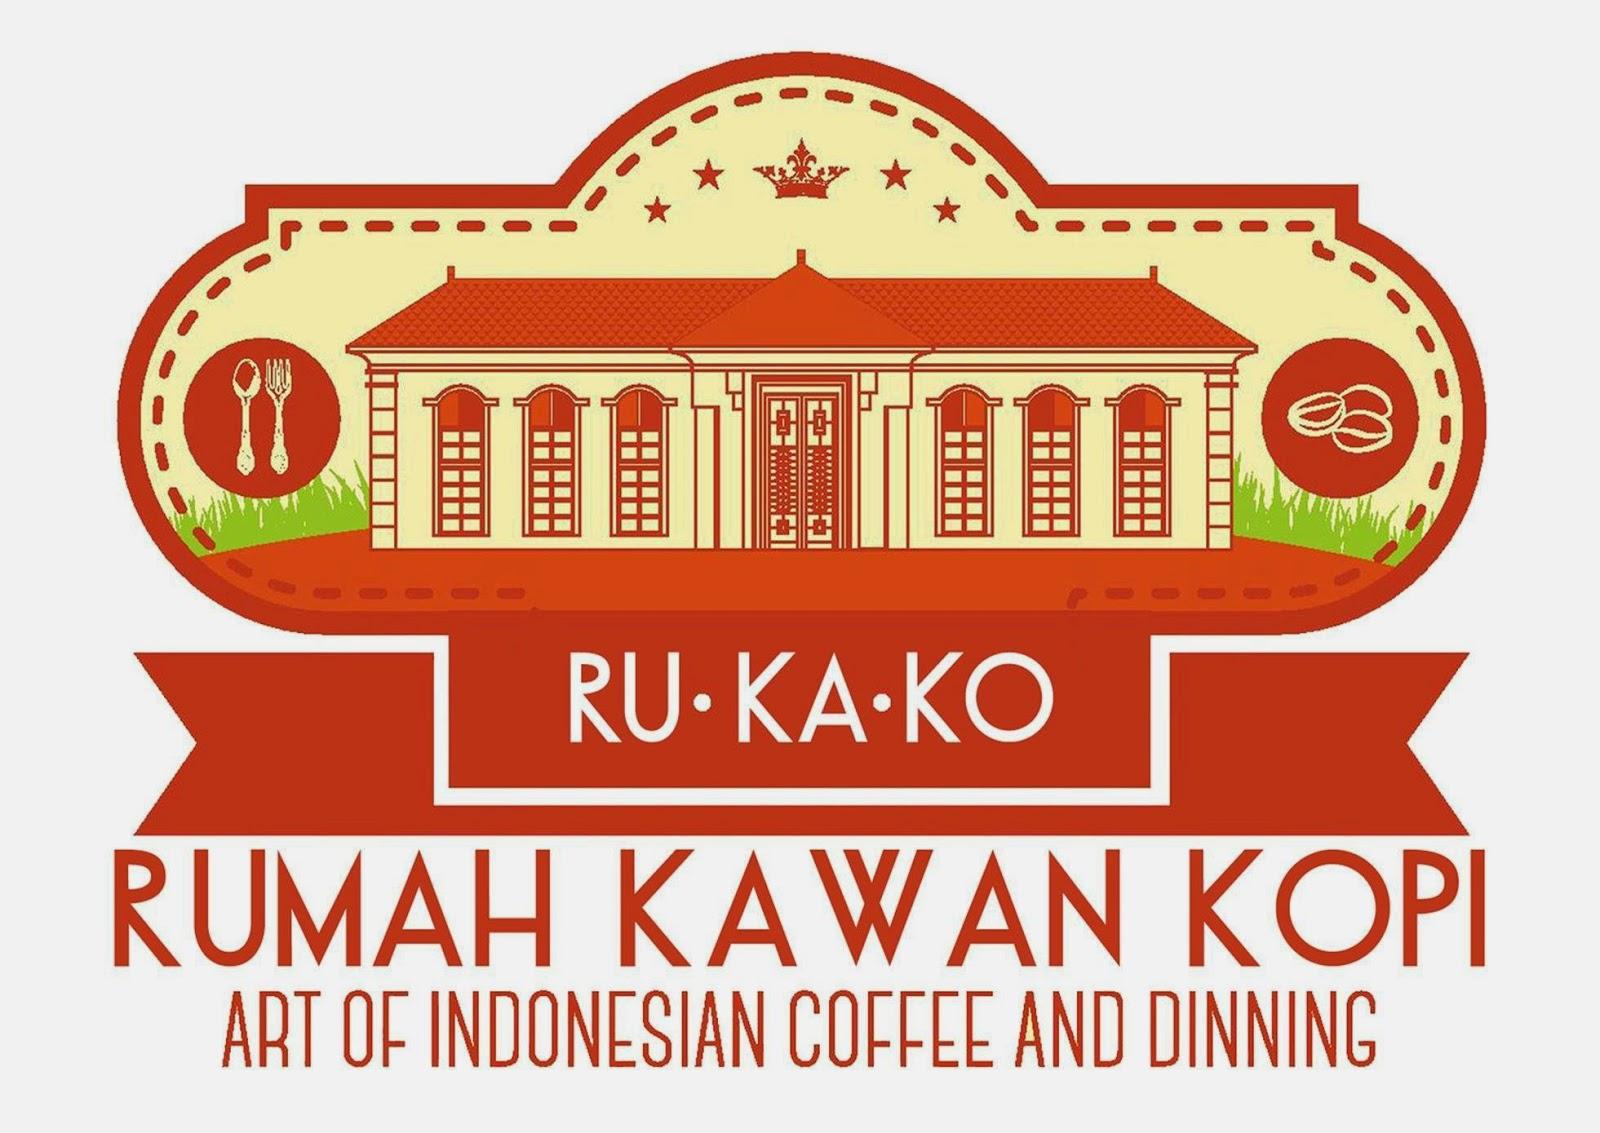 RuKaKo - Rumah Kawan Kopi, Restoran Ala Rumah Bangsawan